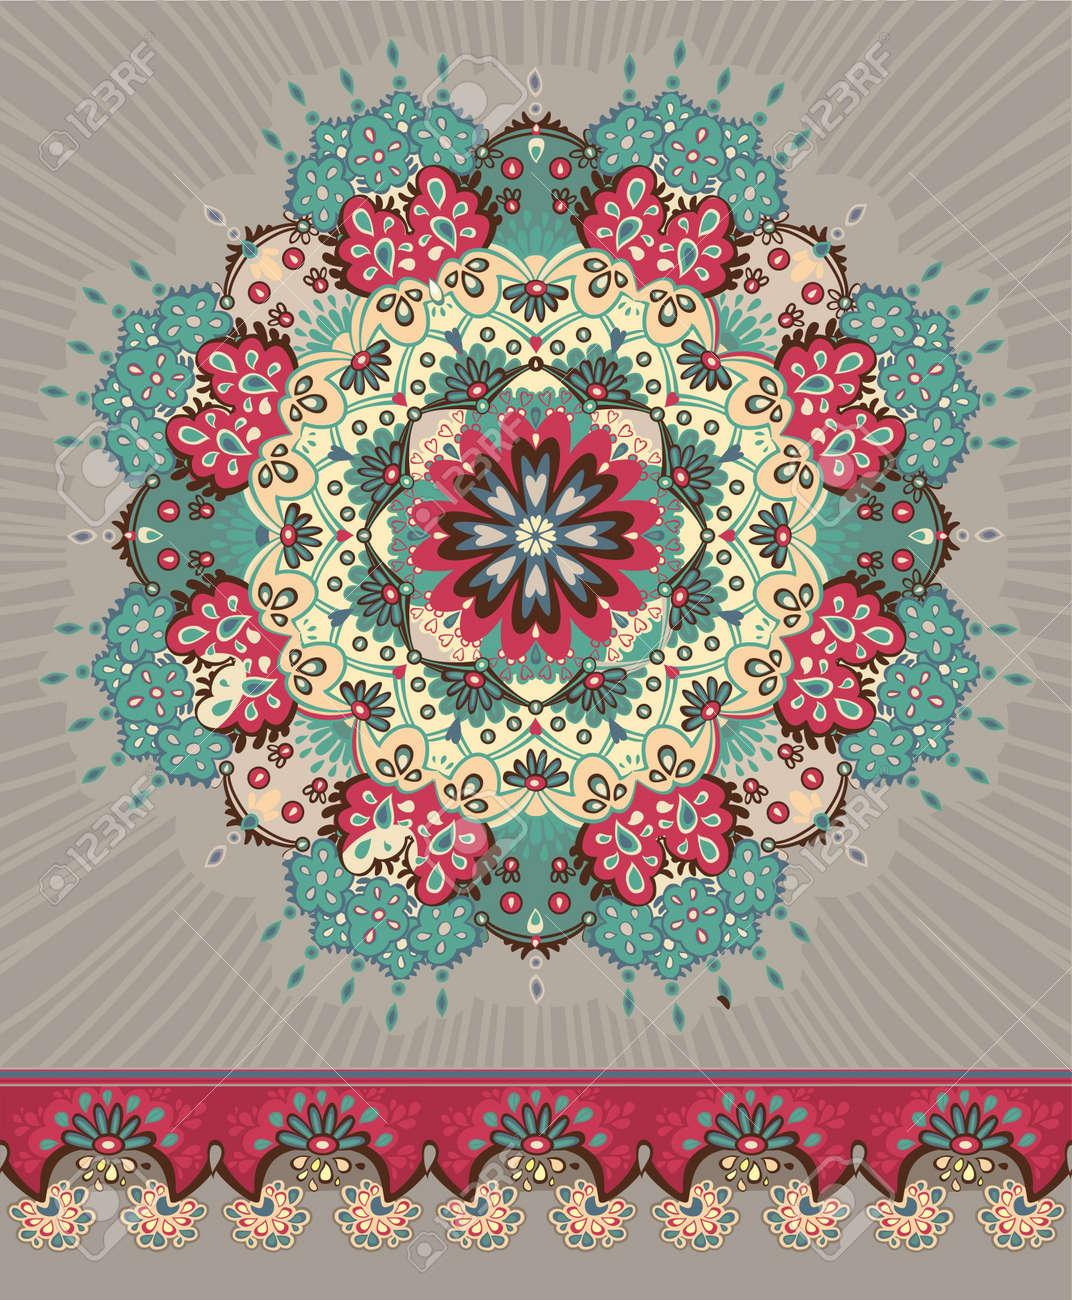 Illustration. Beautiful floral lace pattern. circle. - 12770087